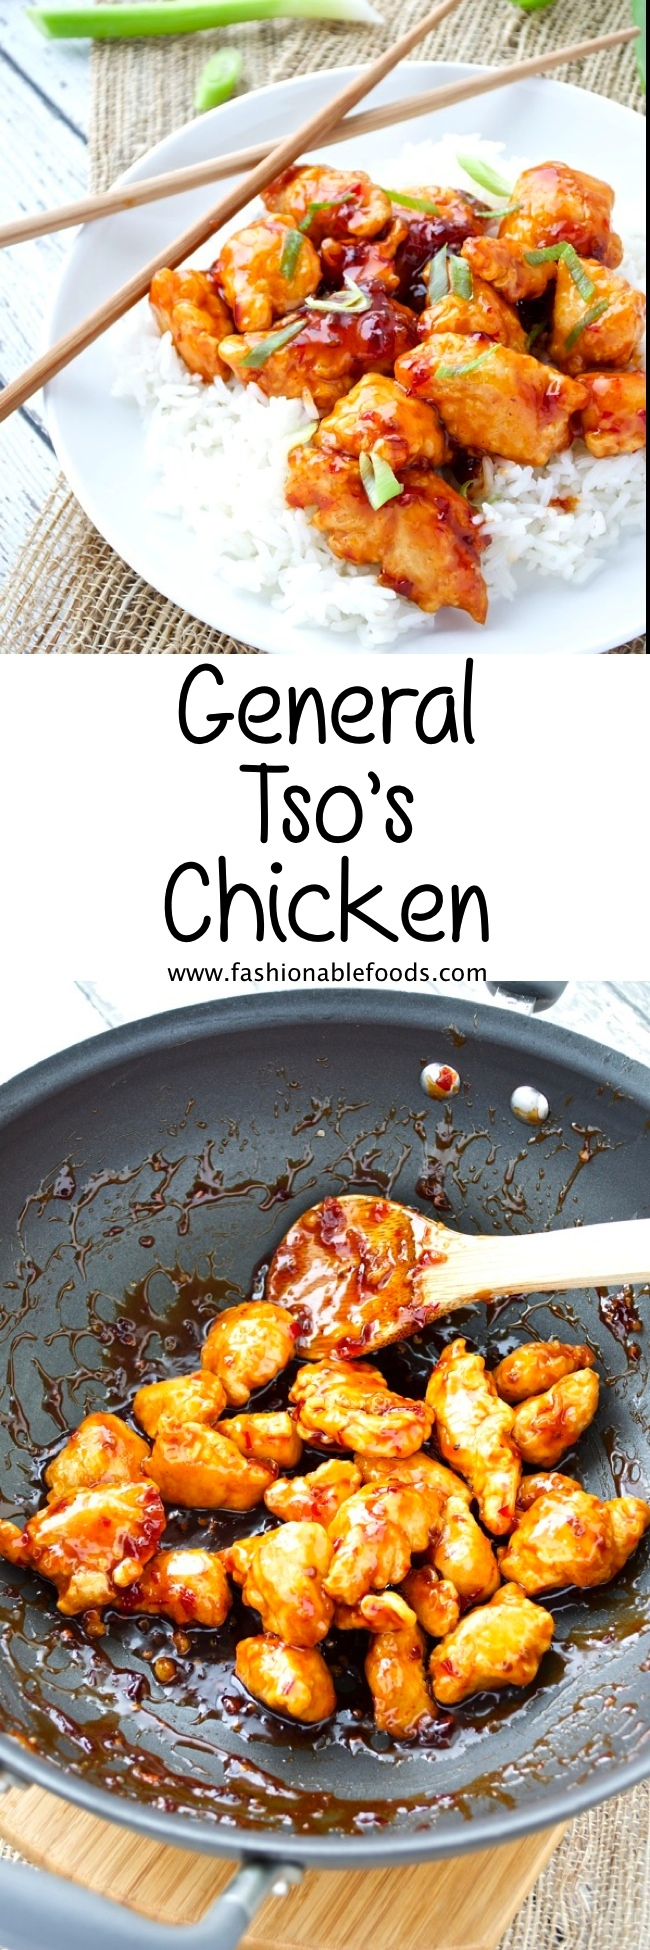 General Tso's Chicken Pin